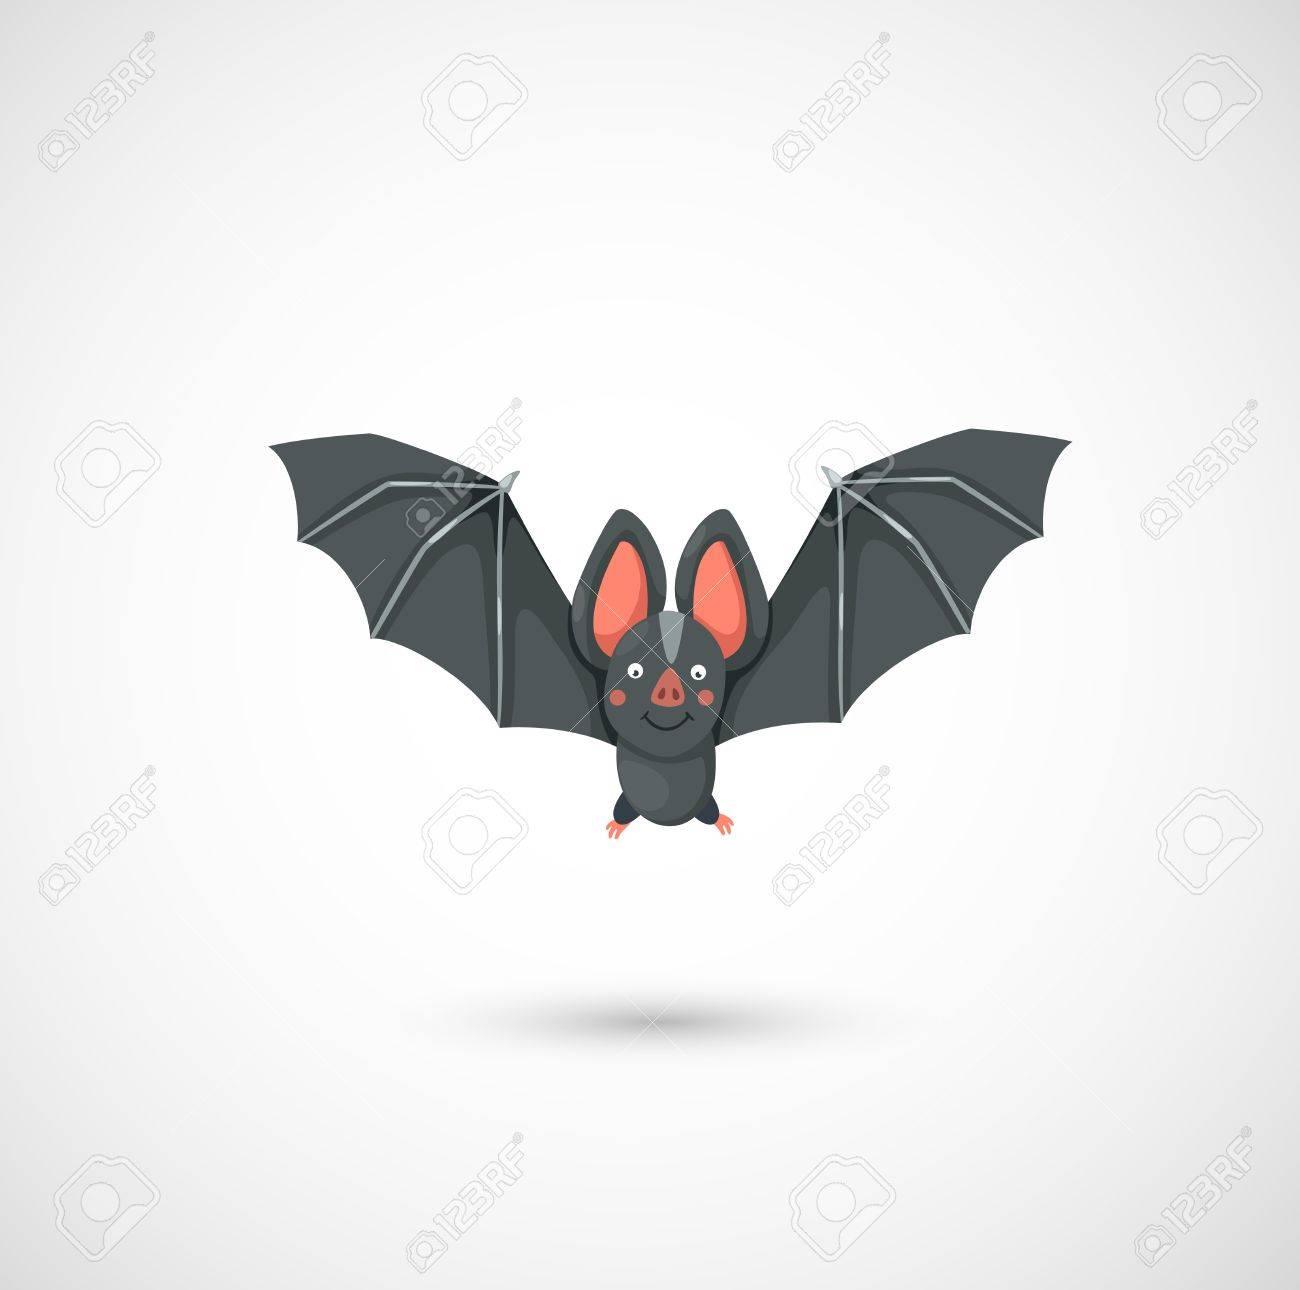 illustration of isolated cartoon bat flying Stock Vector - 19717529